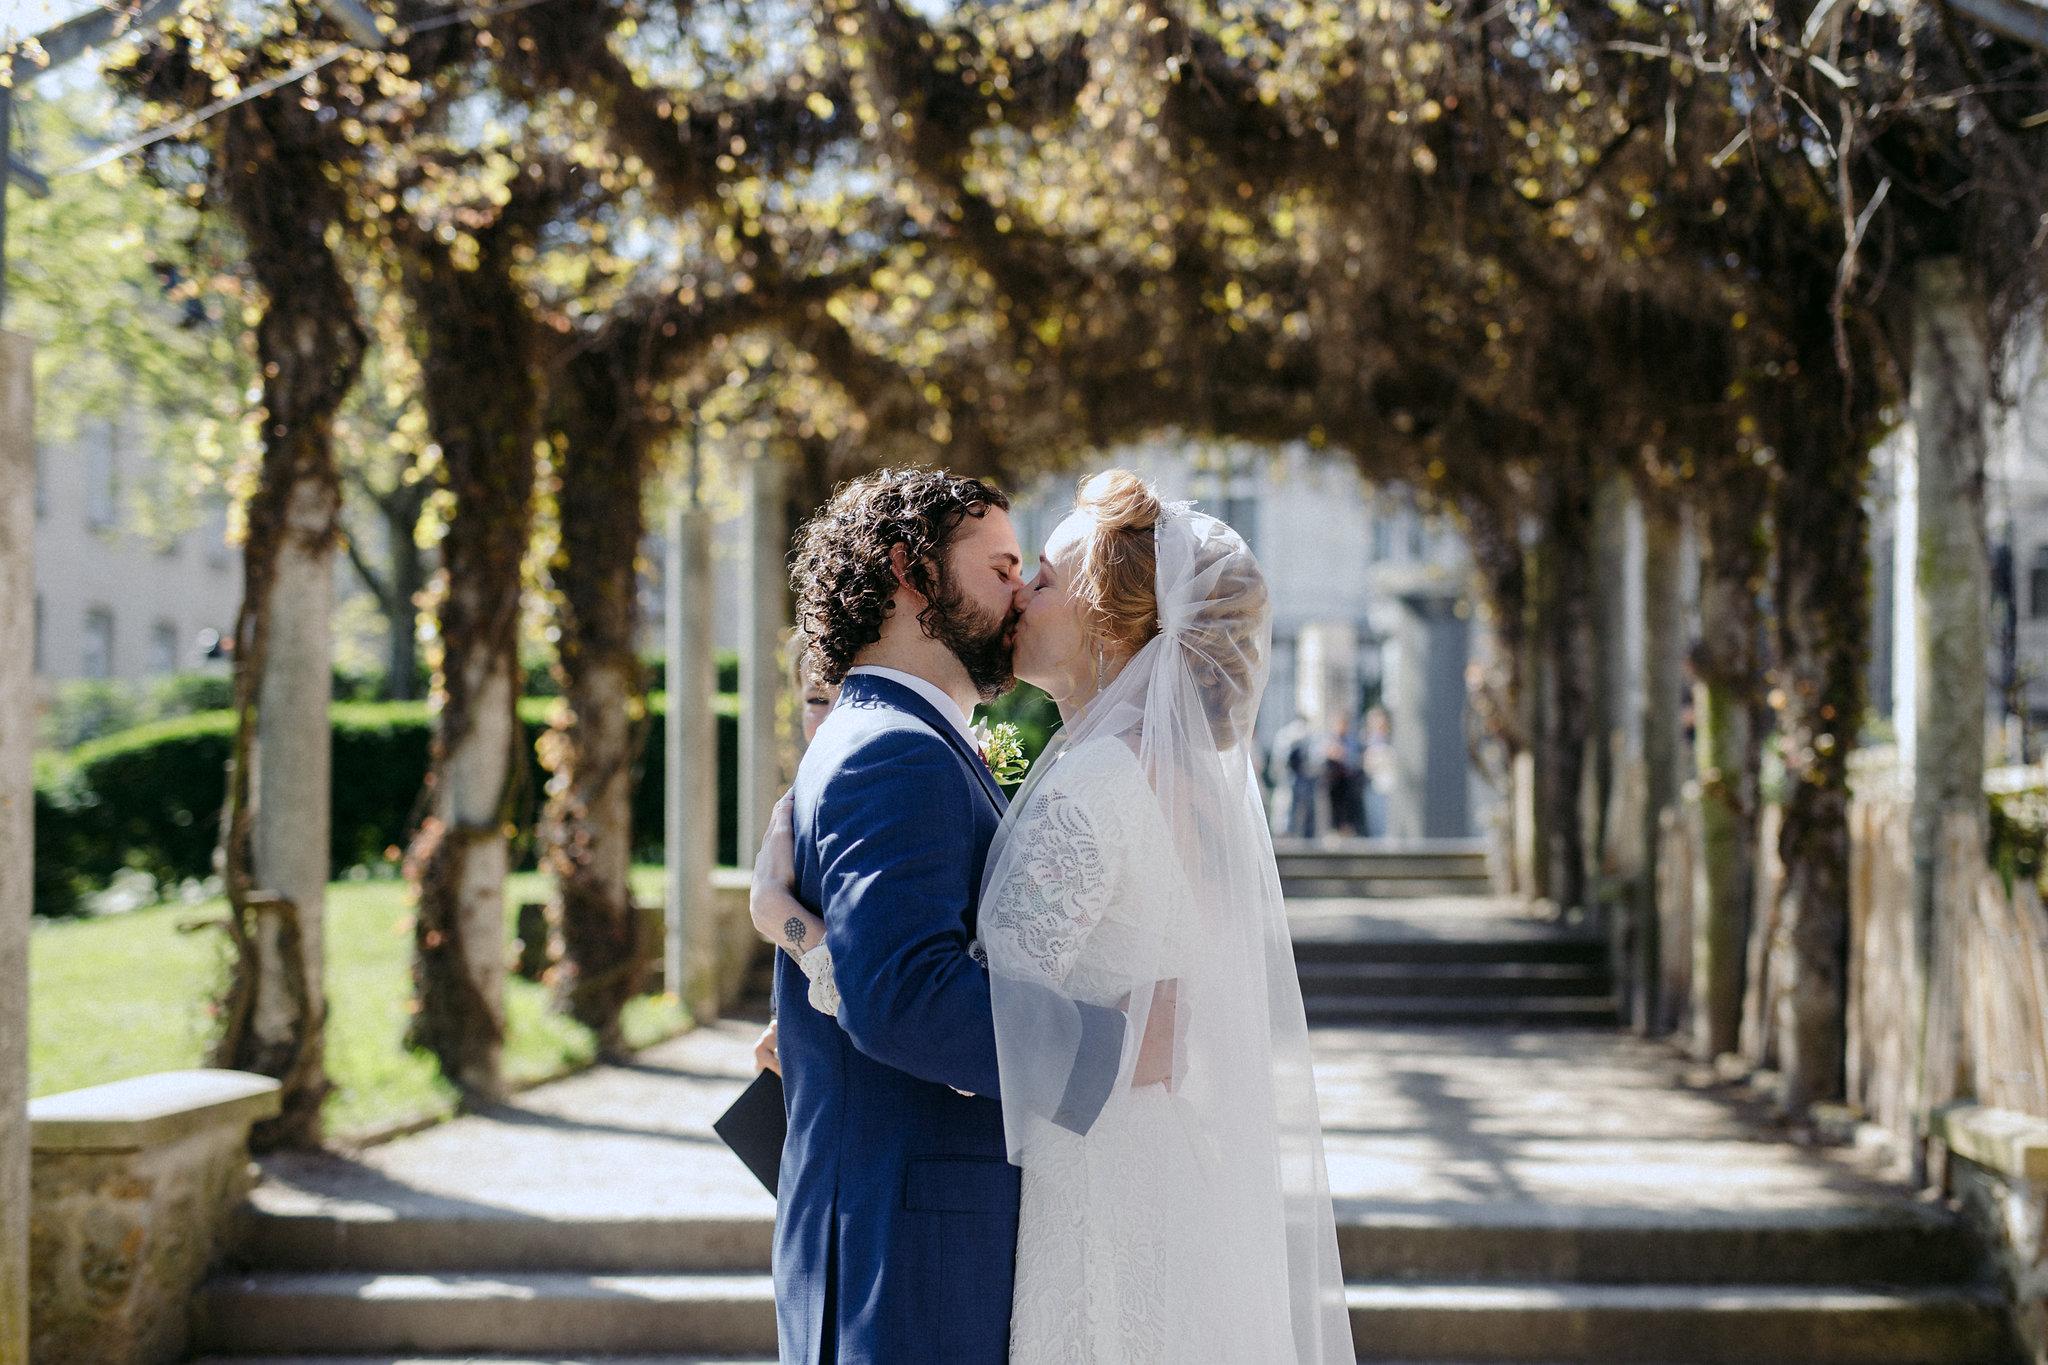 Paris_elopement_wedding_photographer-205.jpg